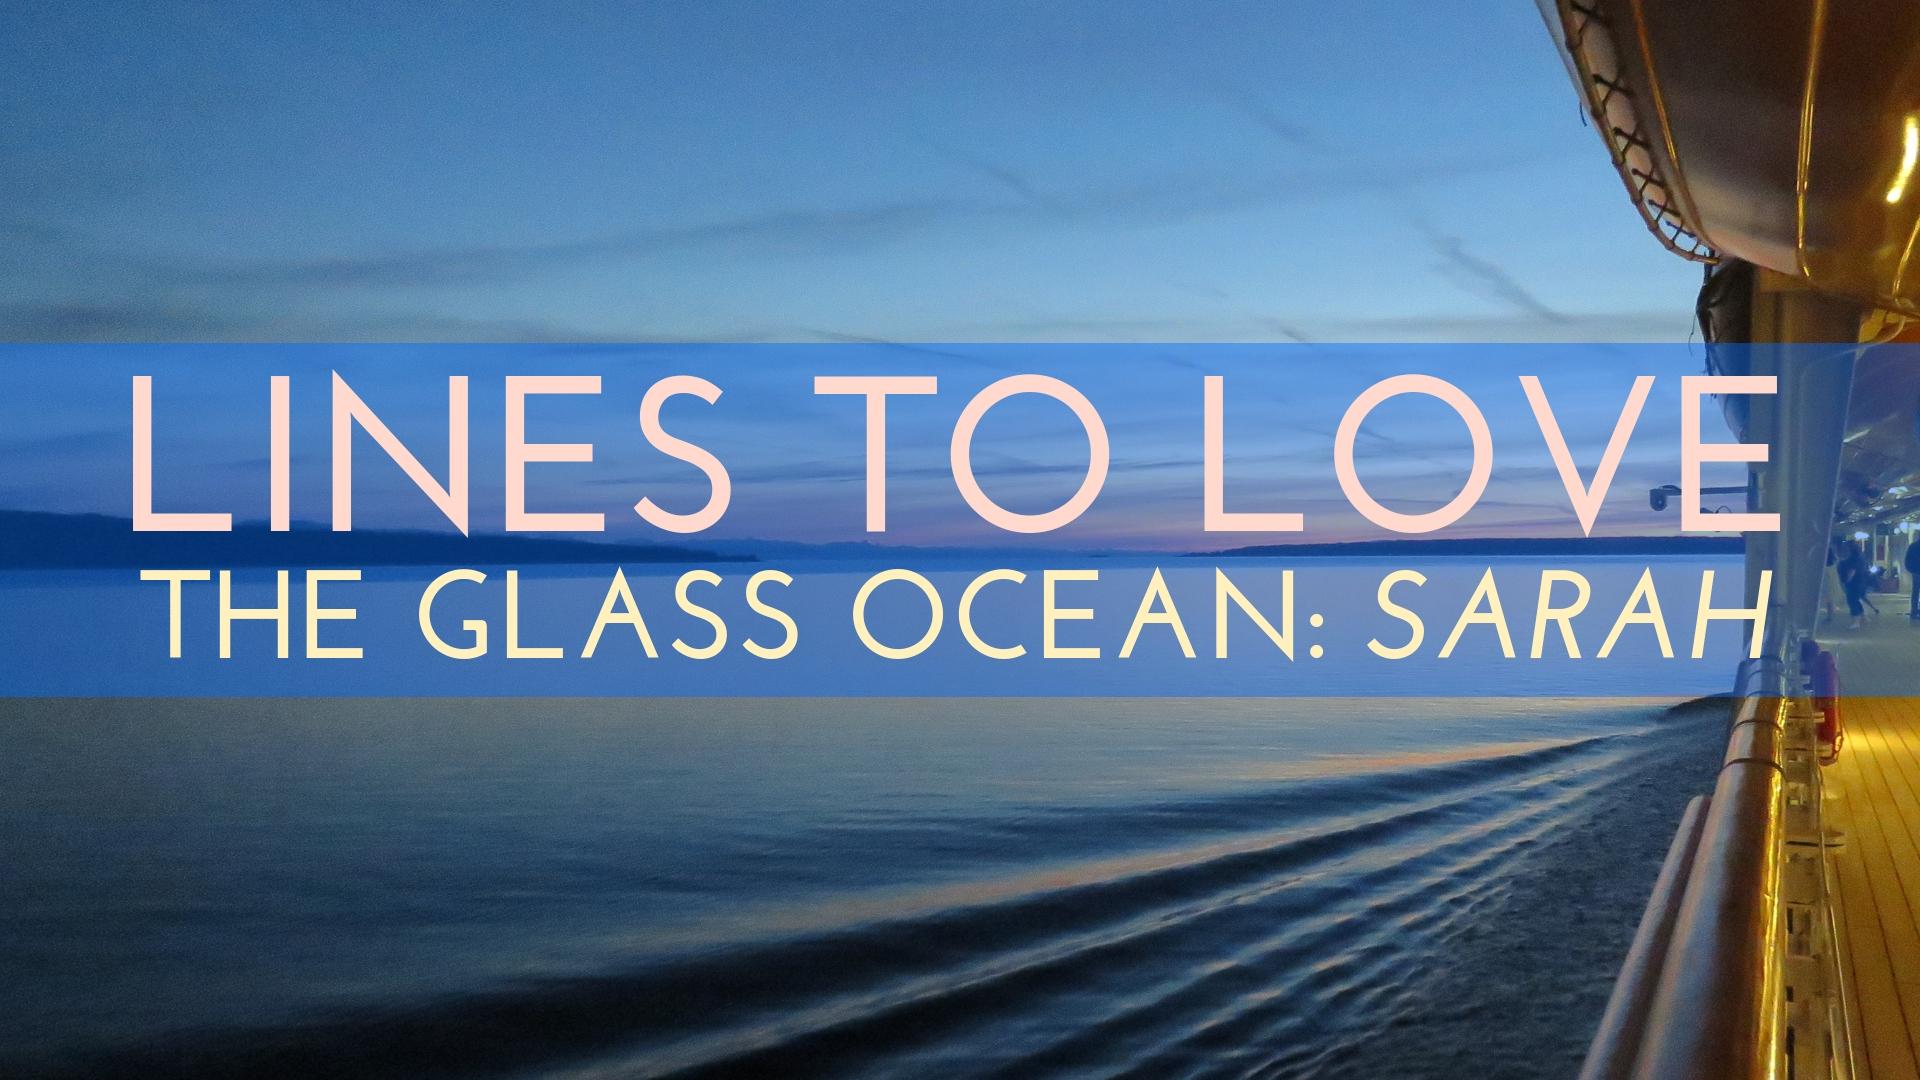 banner-lines-to-love-tgo-sarah-01.jpg